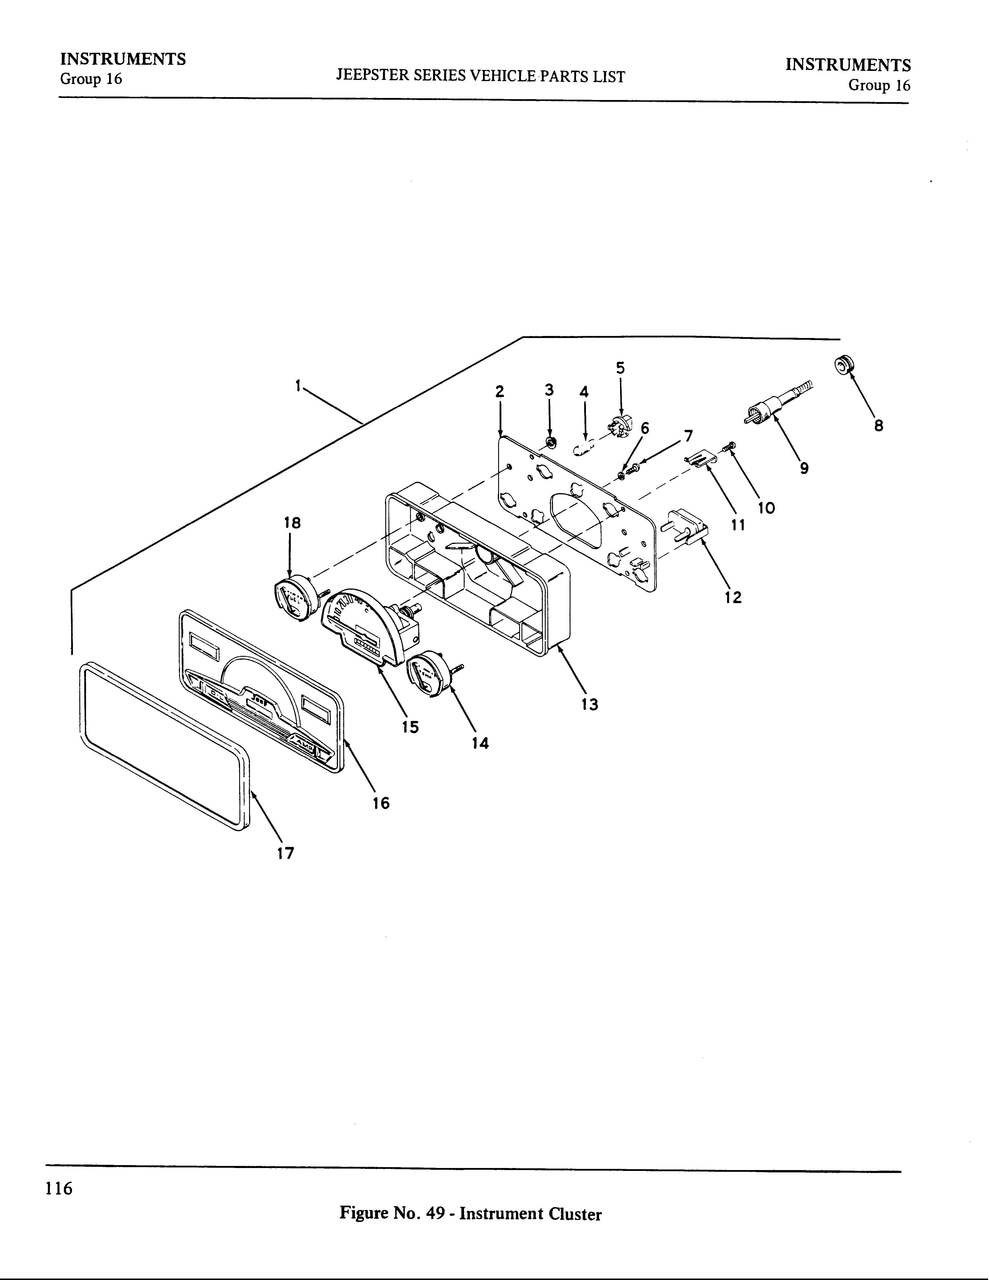 Circuit Board Partsdude4x4 Gauge Cluster Cb1 Larger More Photos